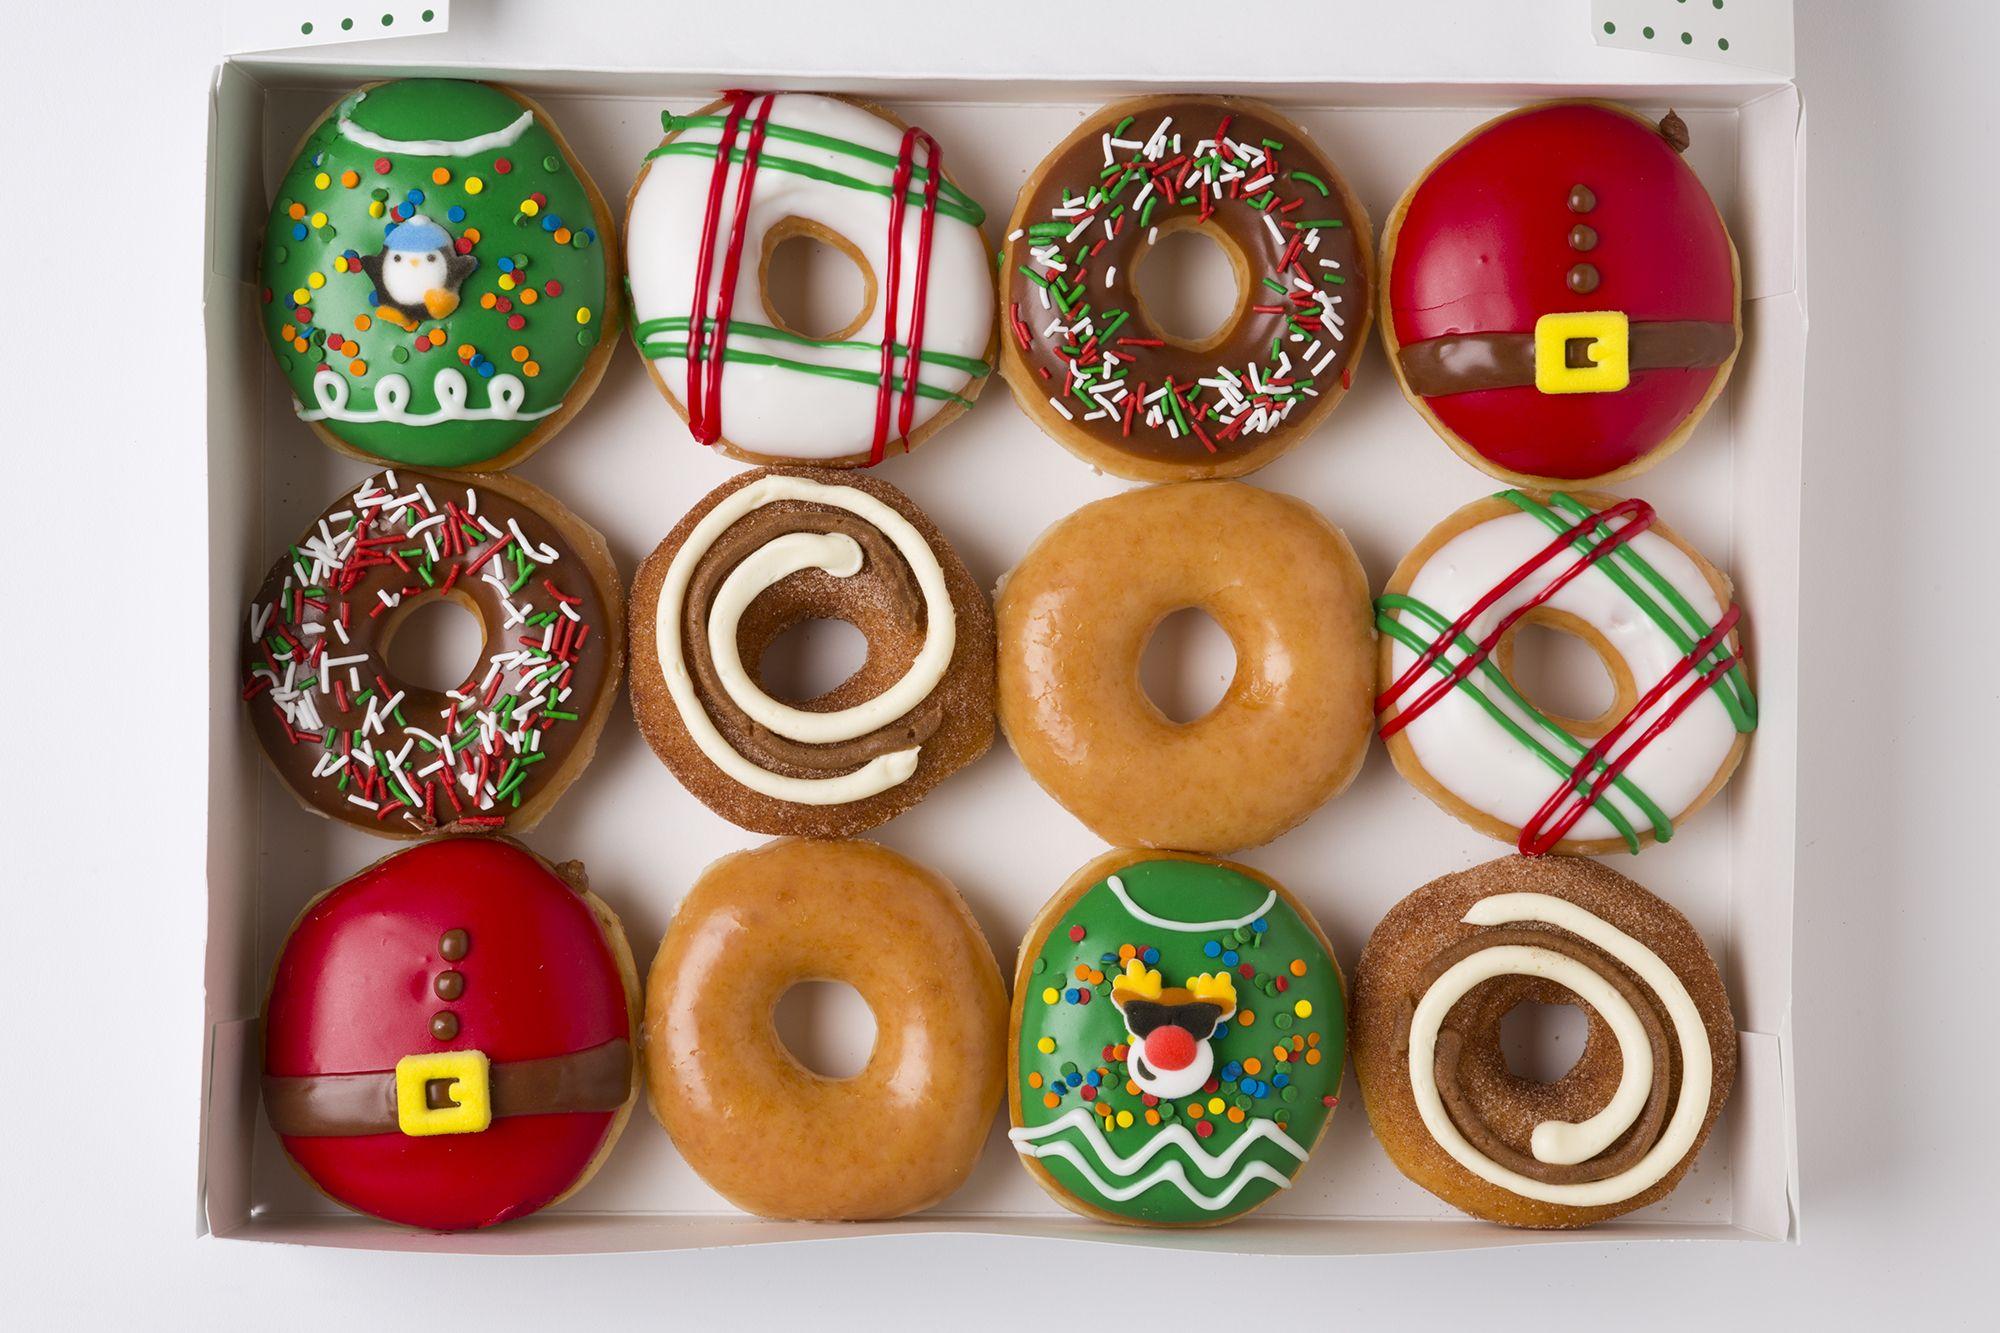 Krispy Kreme Calendar.Krispy Kreme Is Selling A Dozen Donuts For 1 Next Week Krispy